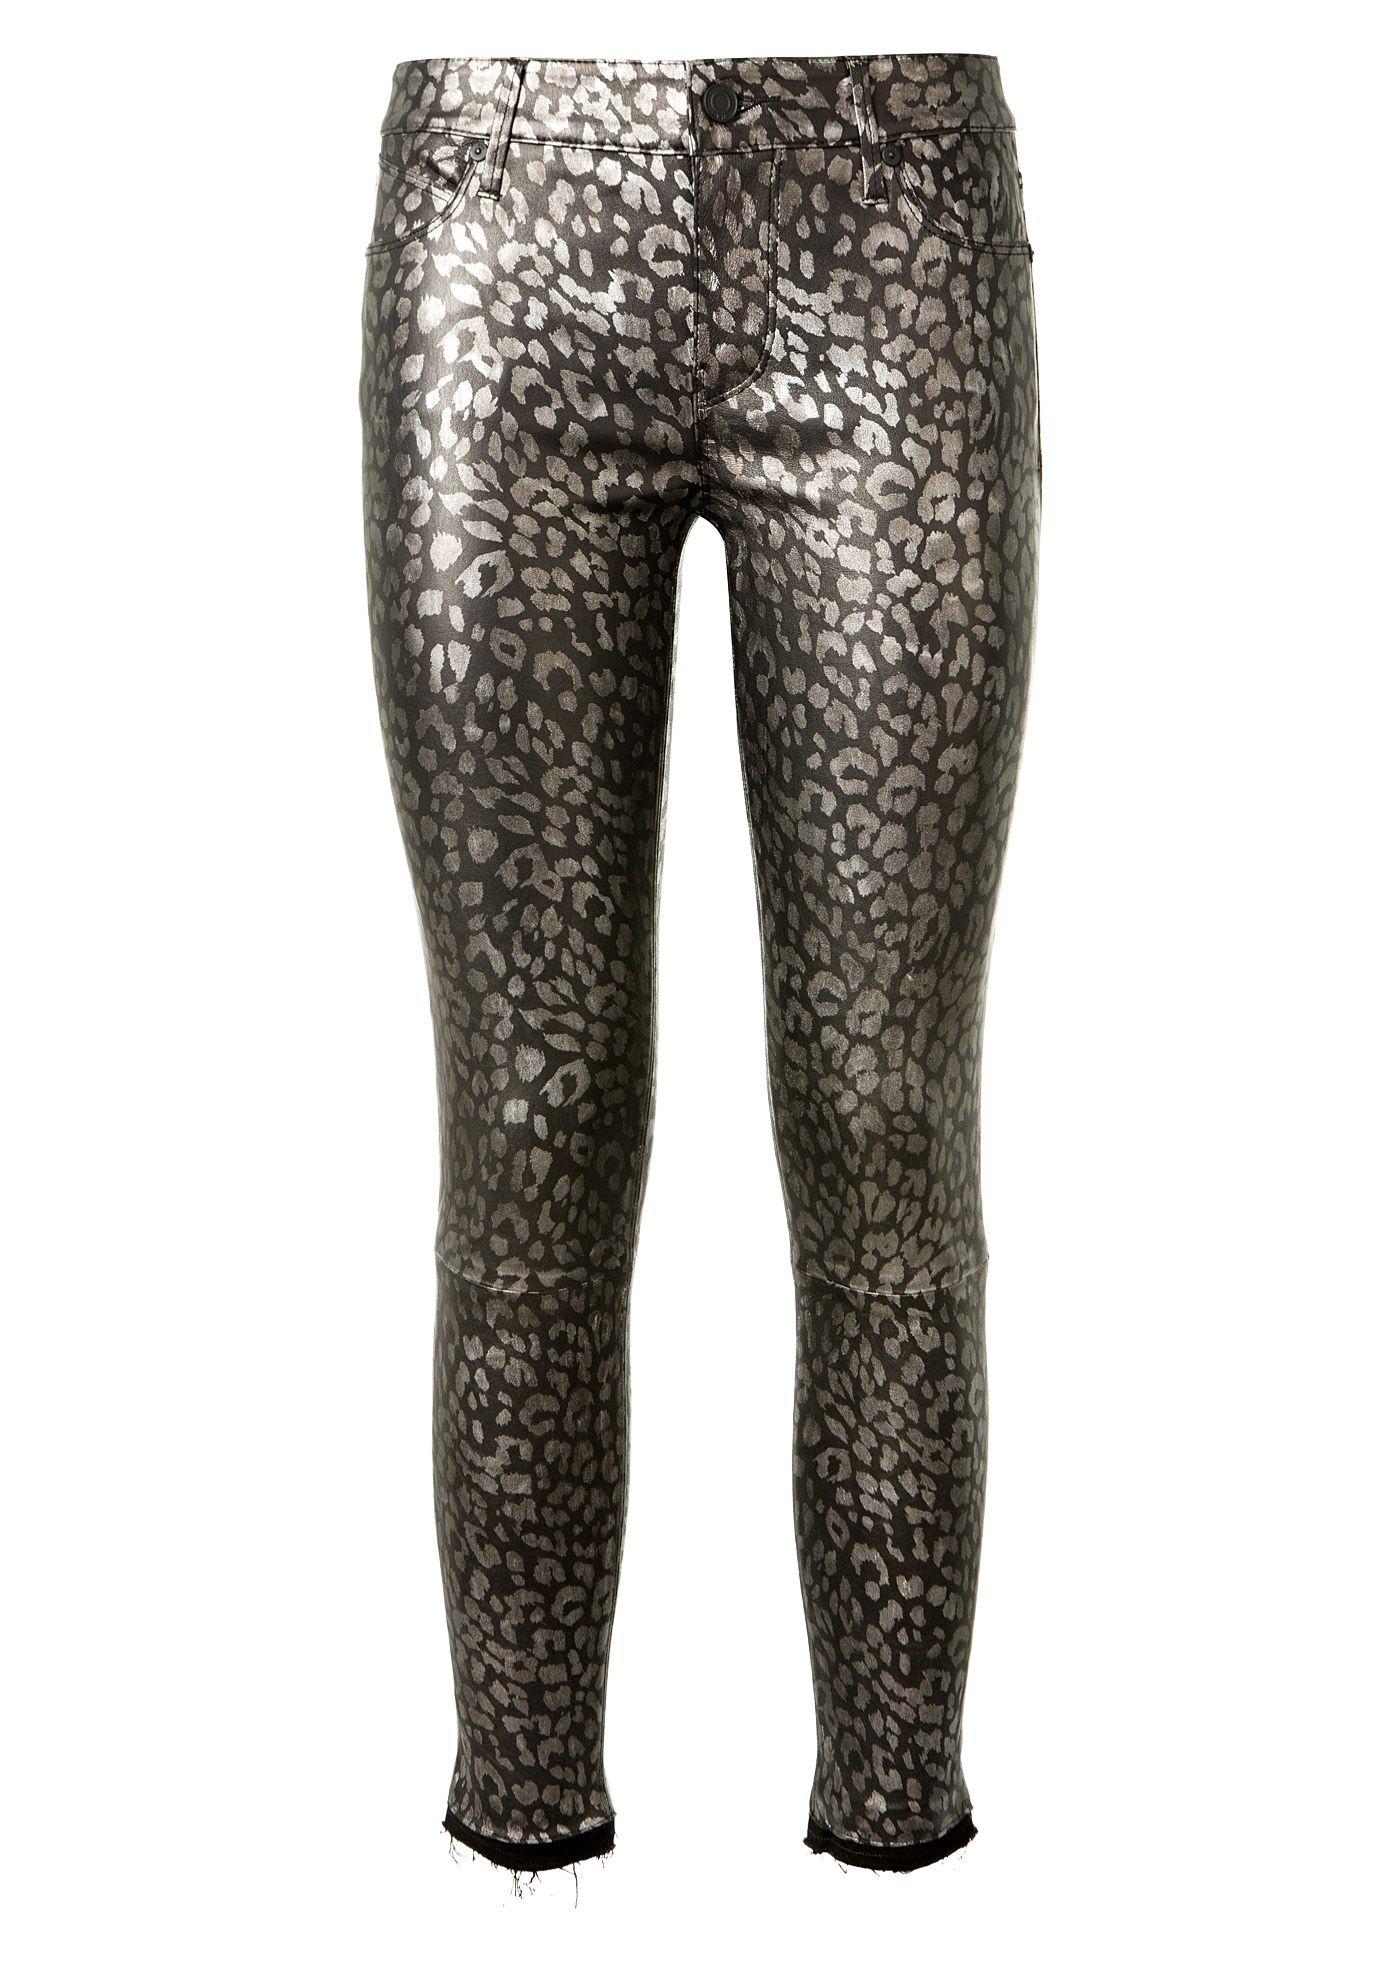 95fef9c61046 RTA Rta Prince Golden Brown Leopard Printed Black Leather Pants. #rta  #cloth #